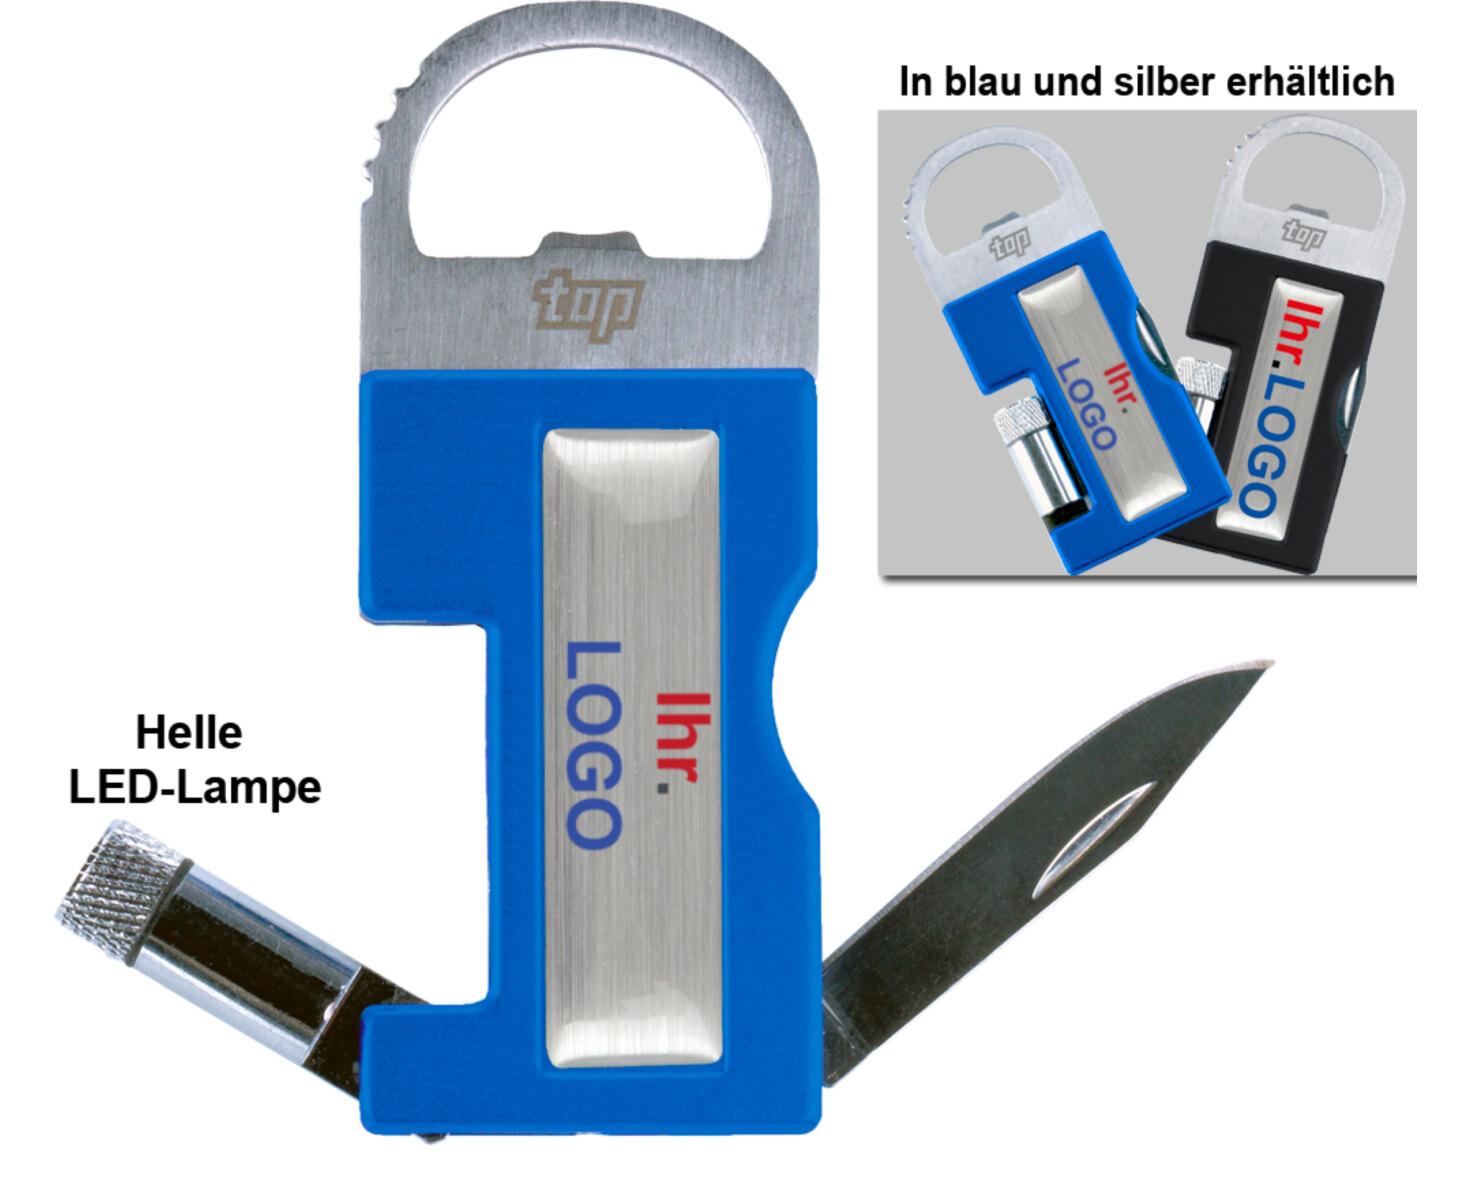 LED-Flaschenöffner Tool